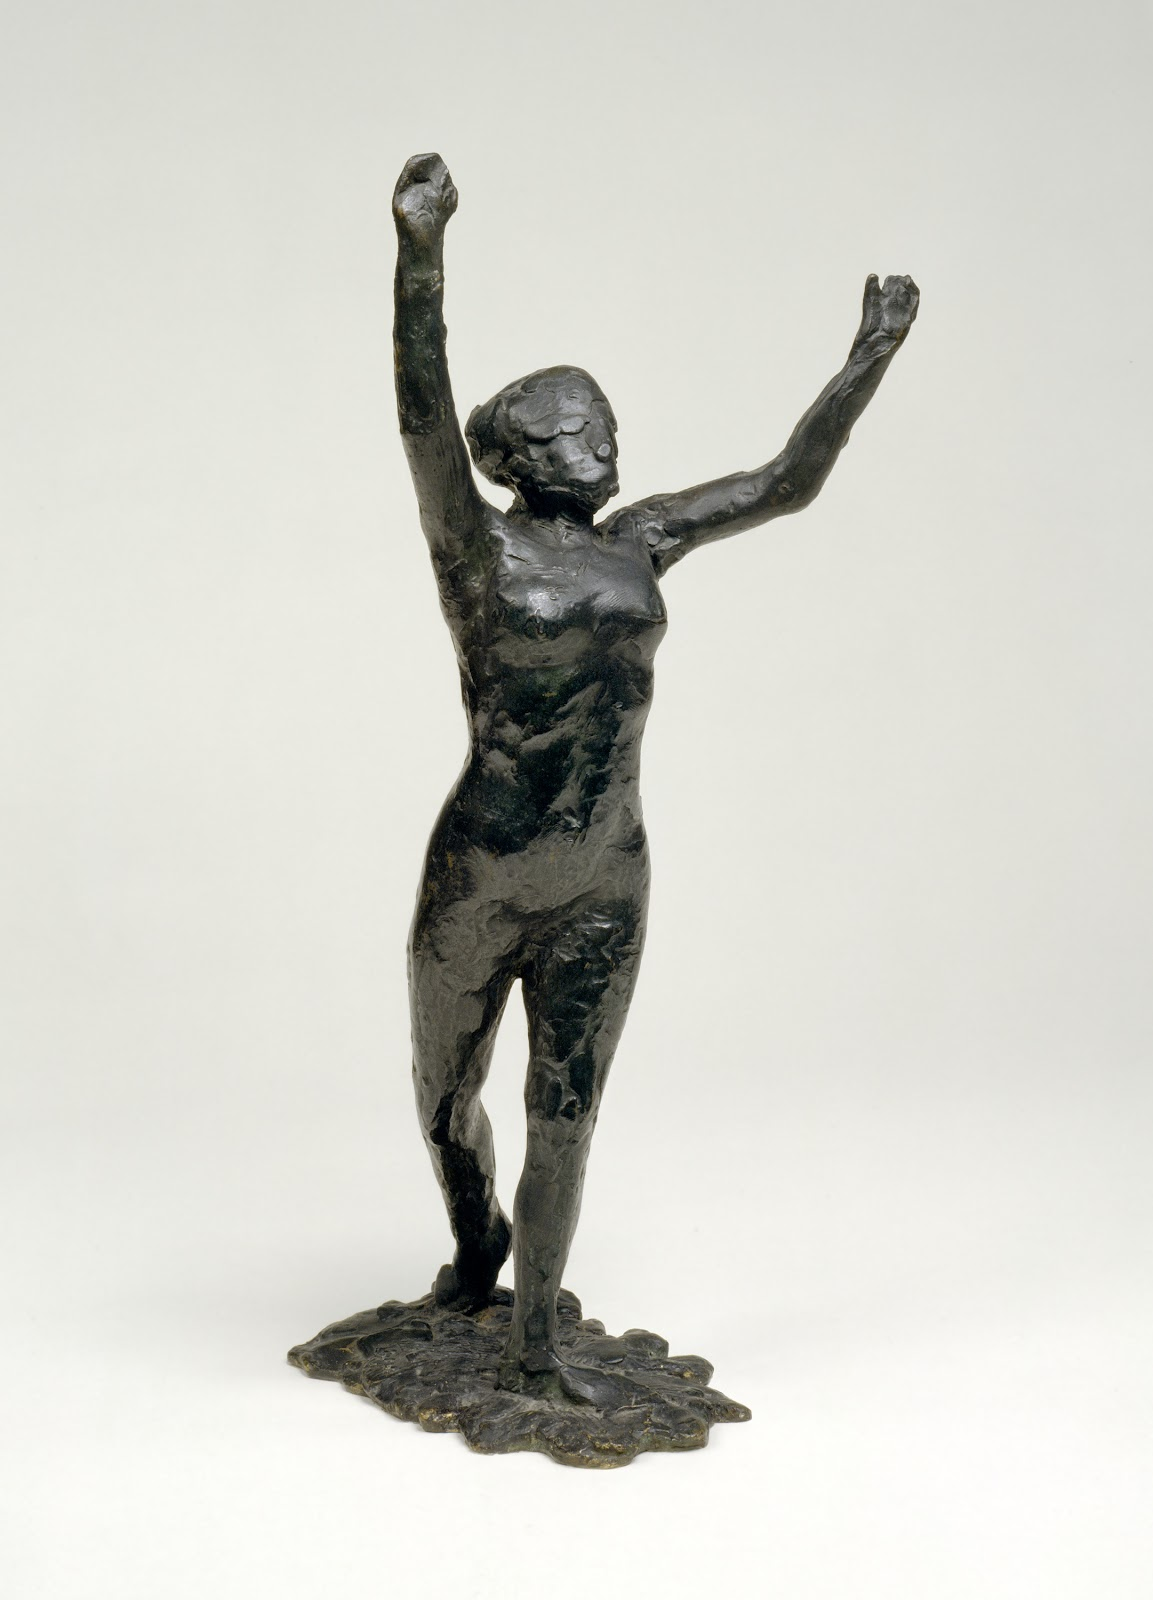 Edgar  Degas  Dancer  Moving  Forward C  Arms  Raised C   E